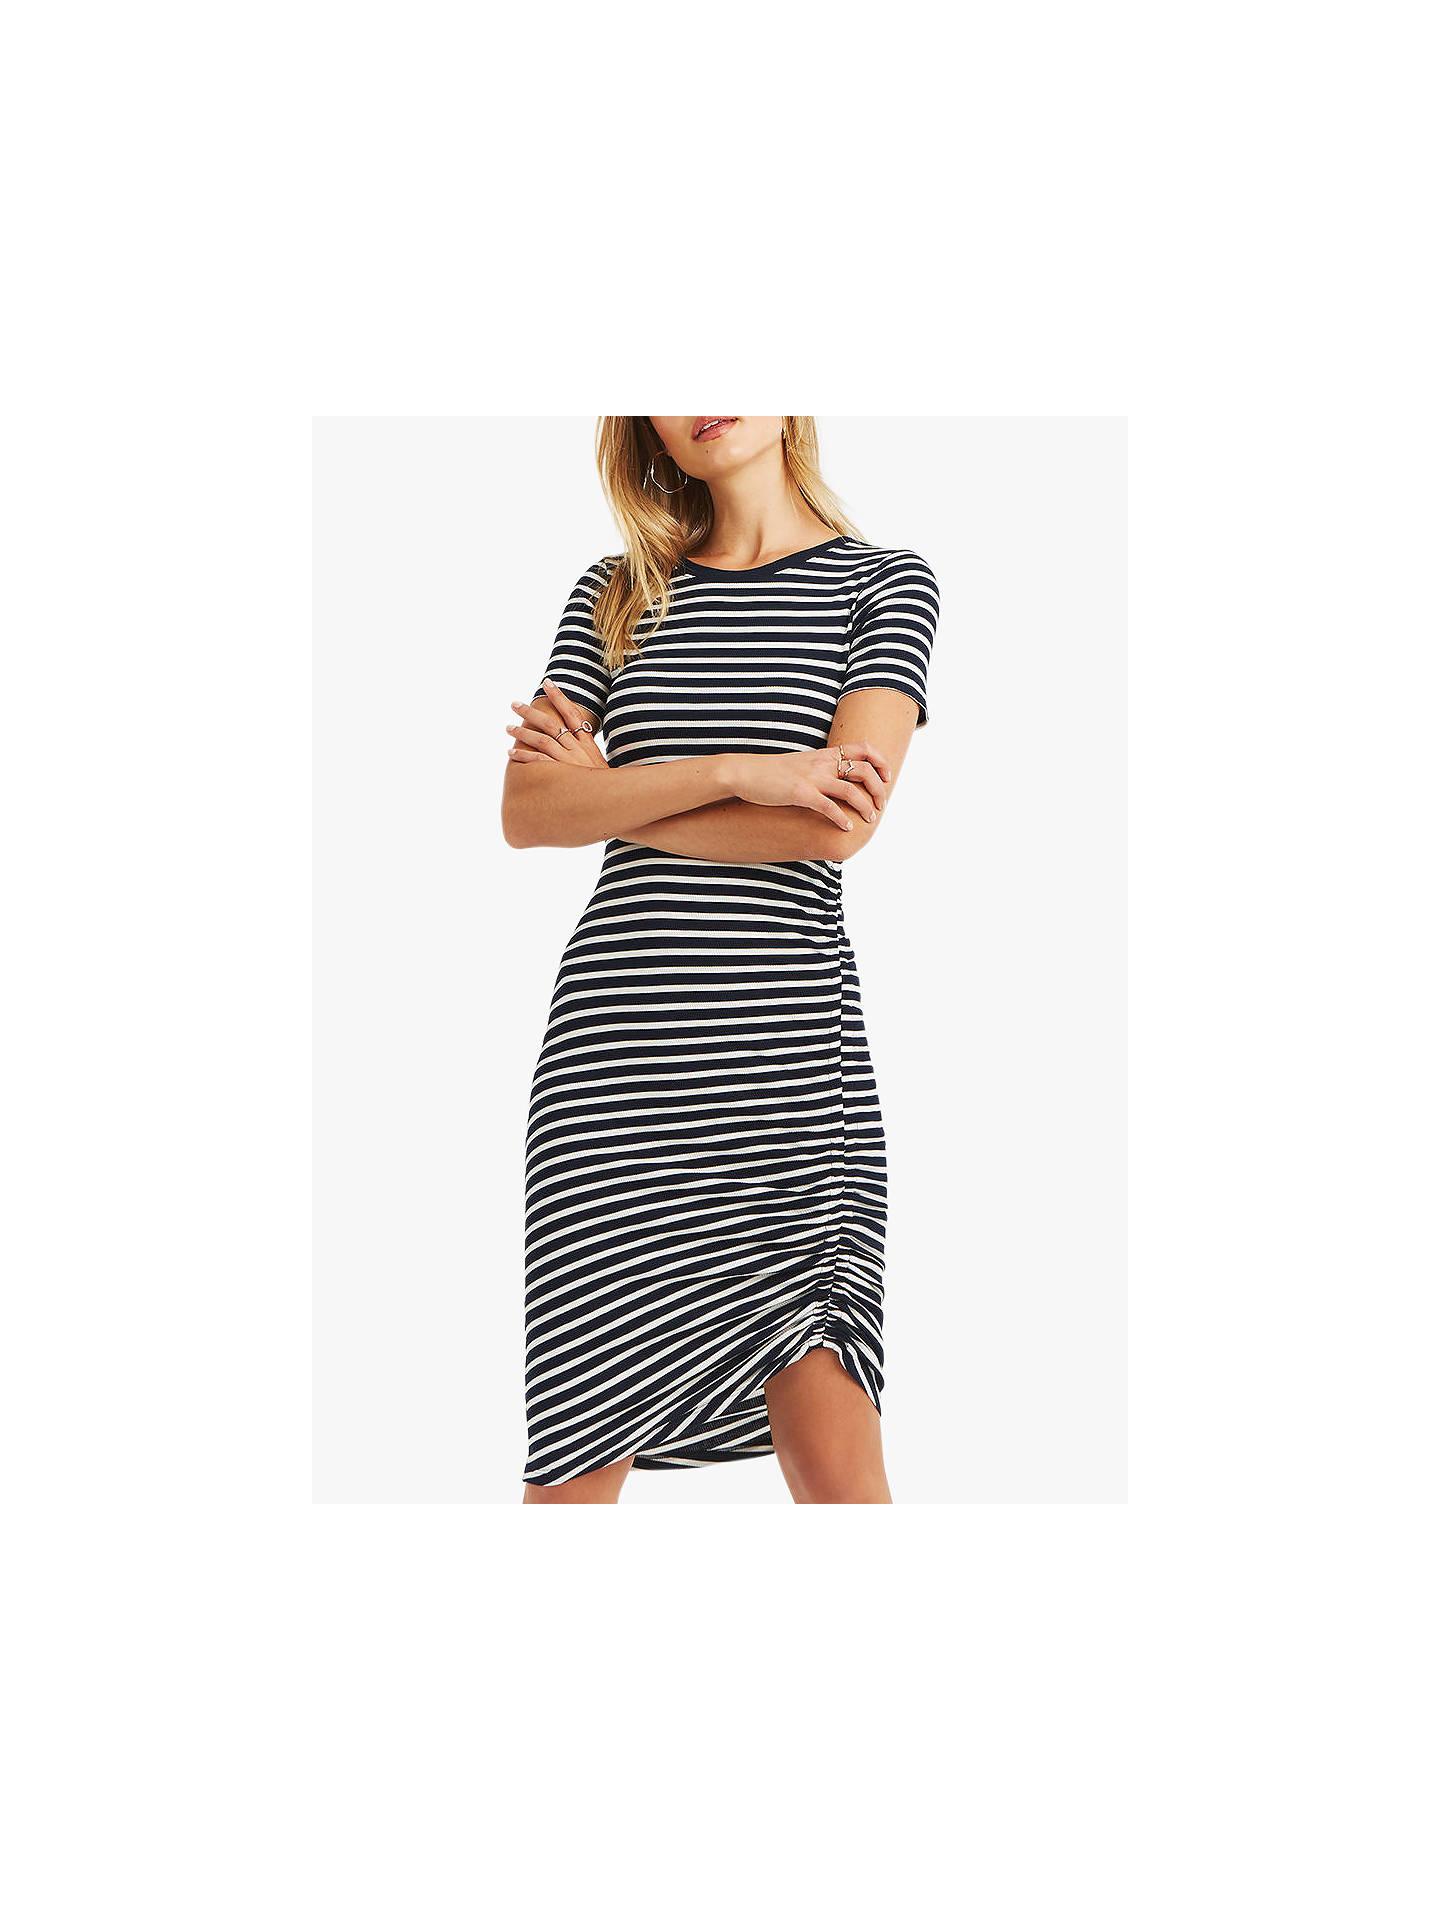 8fb941bea7d2 Buy Oasis Asymmetric Striped Jersey Dress, Multi, XL Online at  johnlewis.com ...